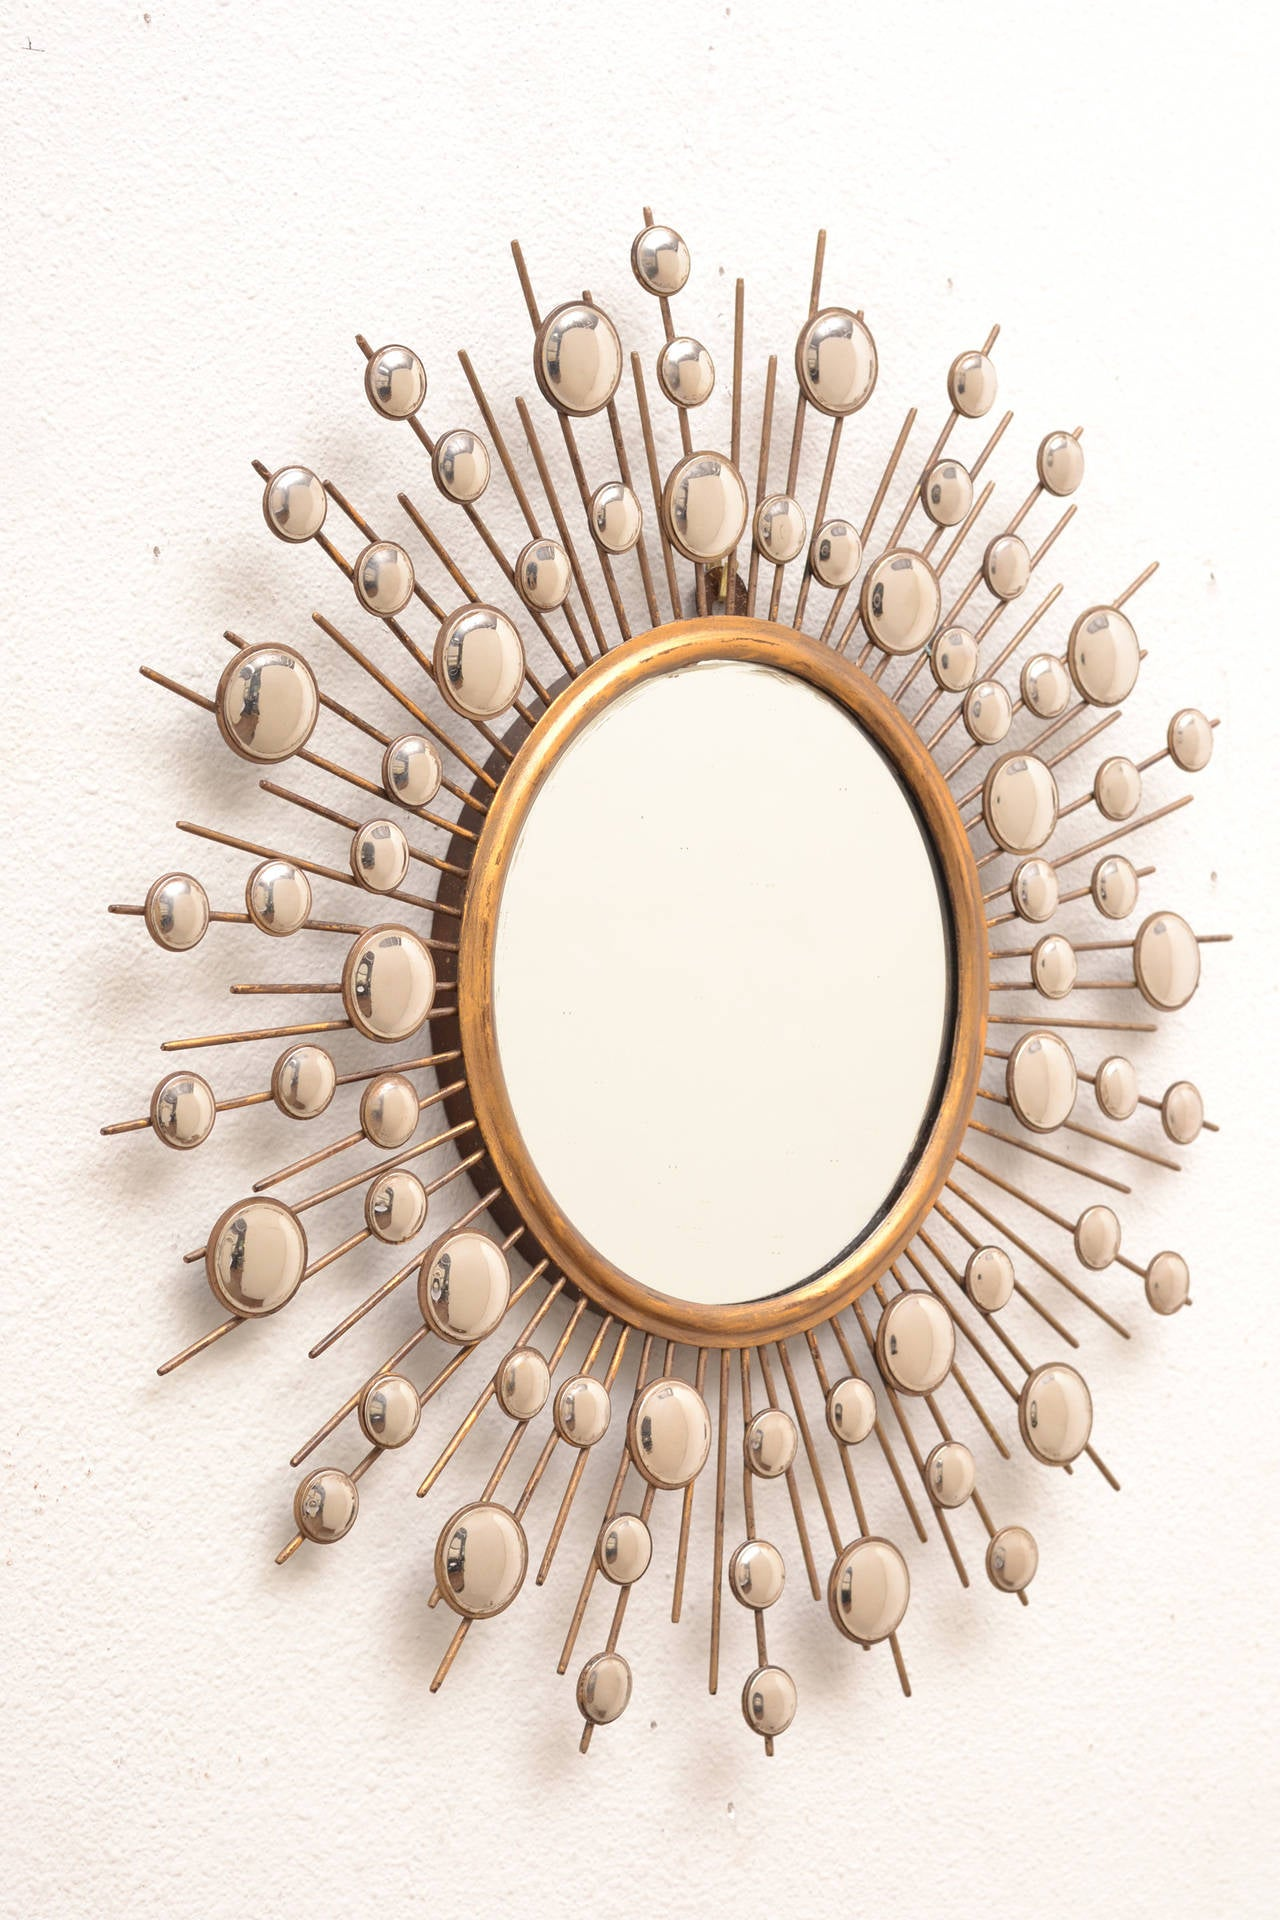 French vintage brass sunburst mirror surrounded by smaller for Sunburst mirror